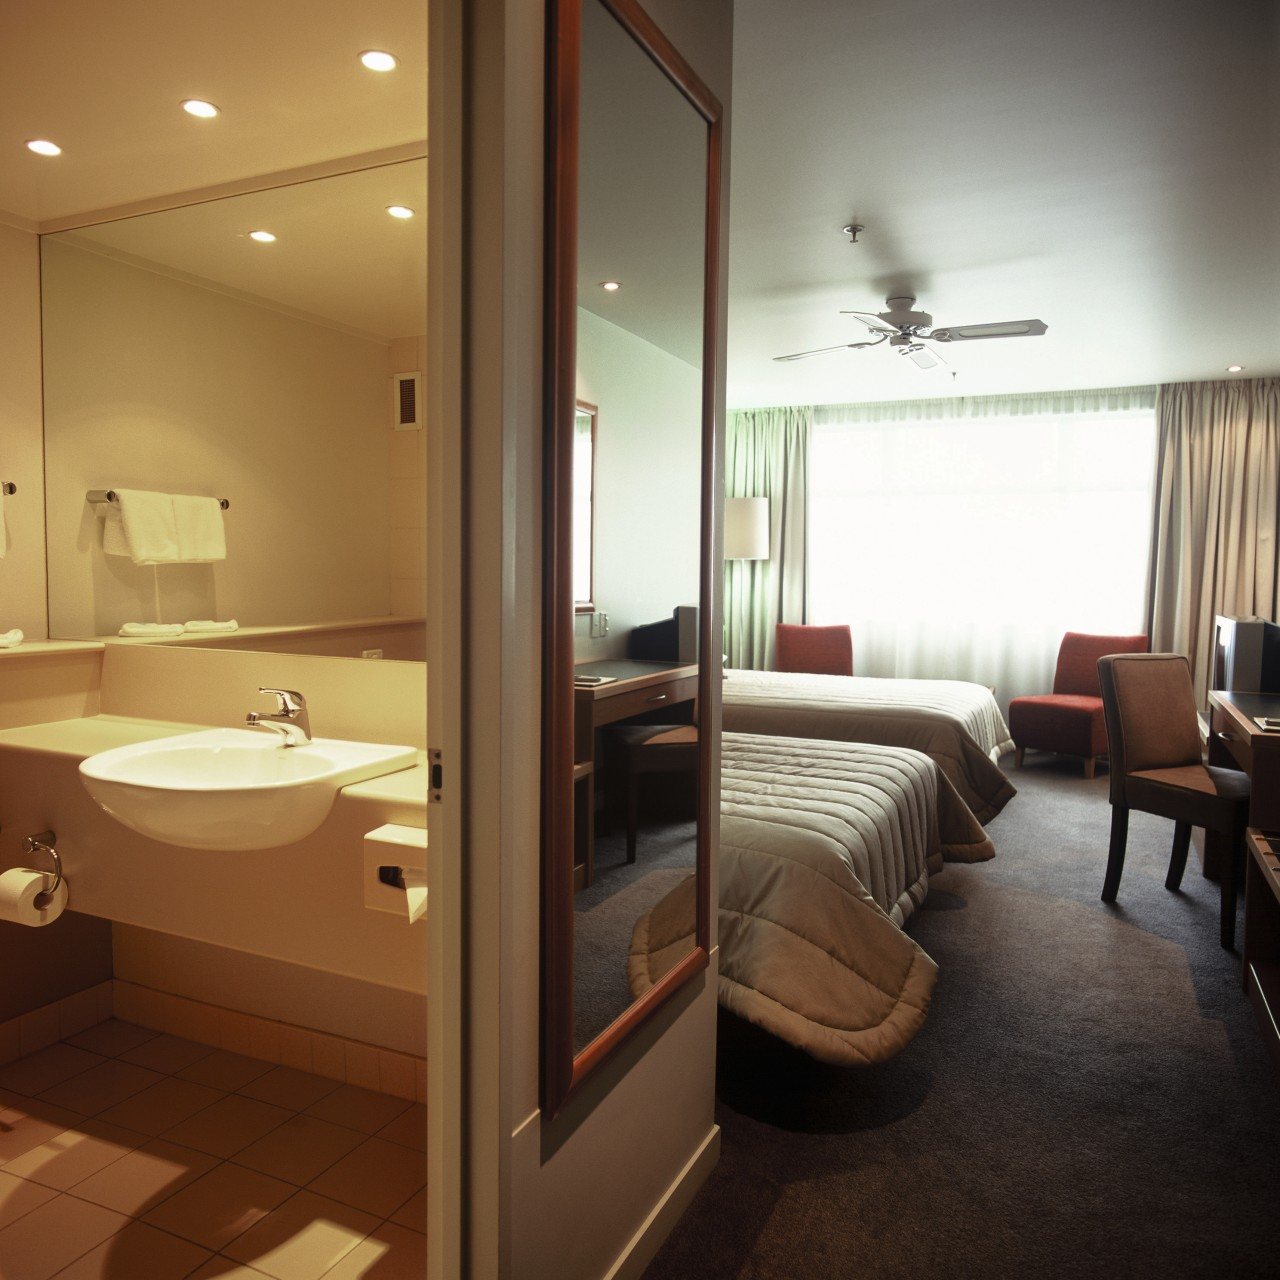 Bathroom and bedroom suite in natural colours, brown bathroom, ceiling, floor, flooring, interior design, room, suite, brown